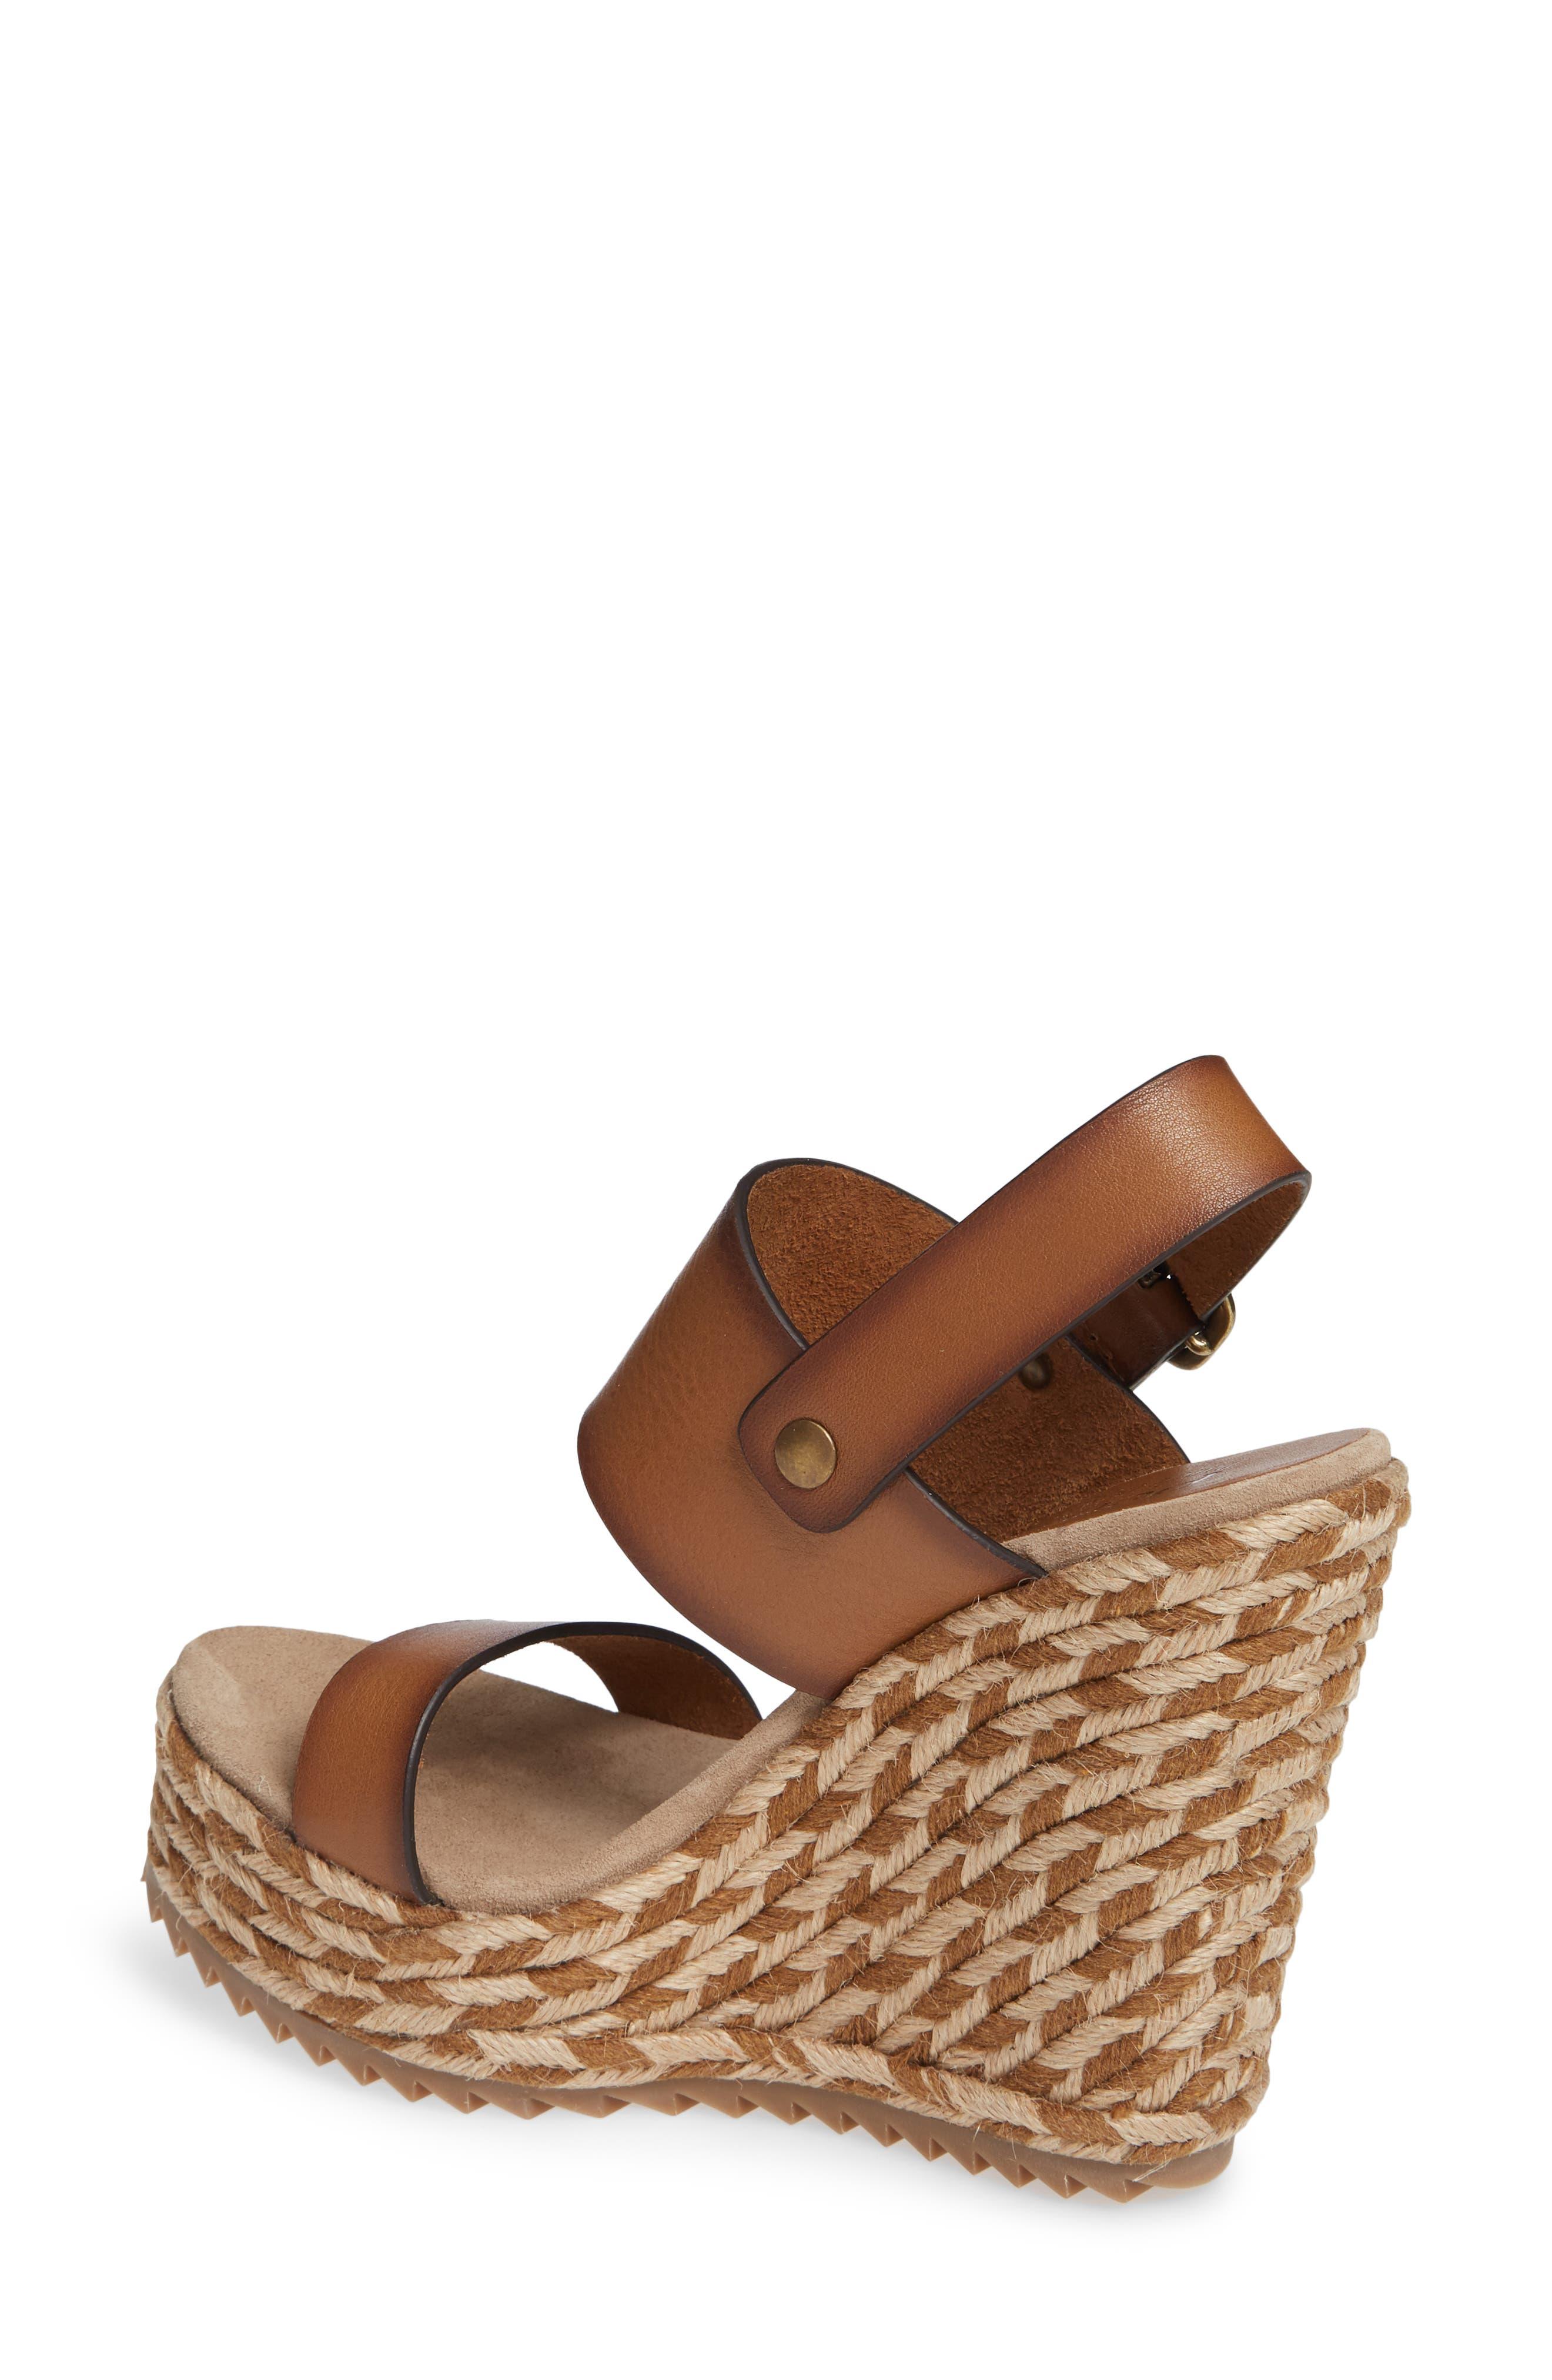 Tait Woven Wedge Sandal,                             Alternate thumbnail 2, color,                             CIGAR VACCHETTA